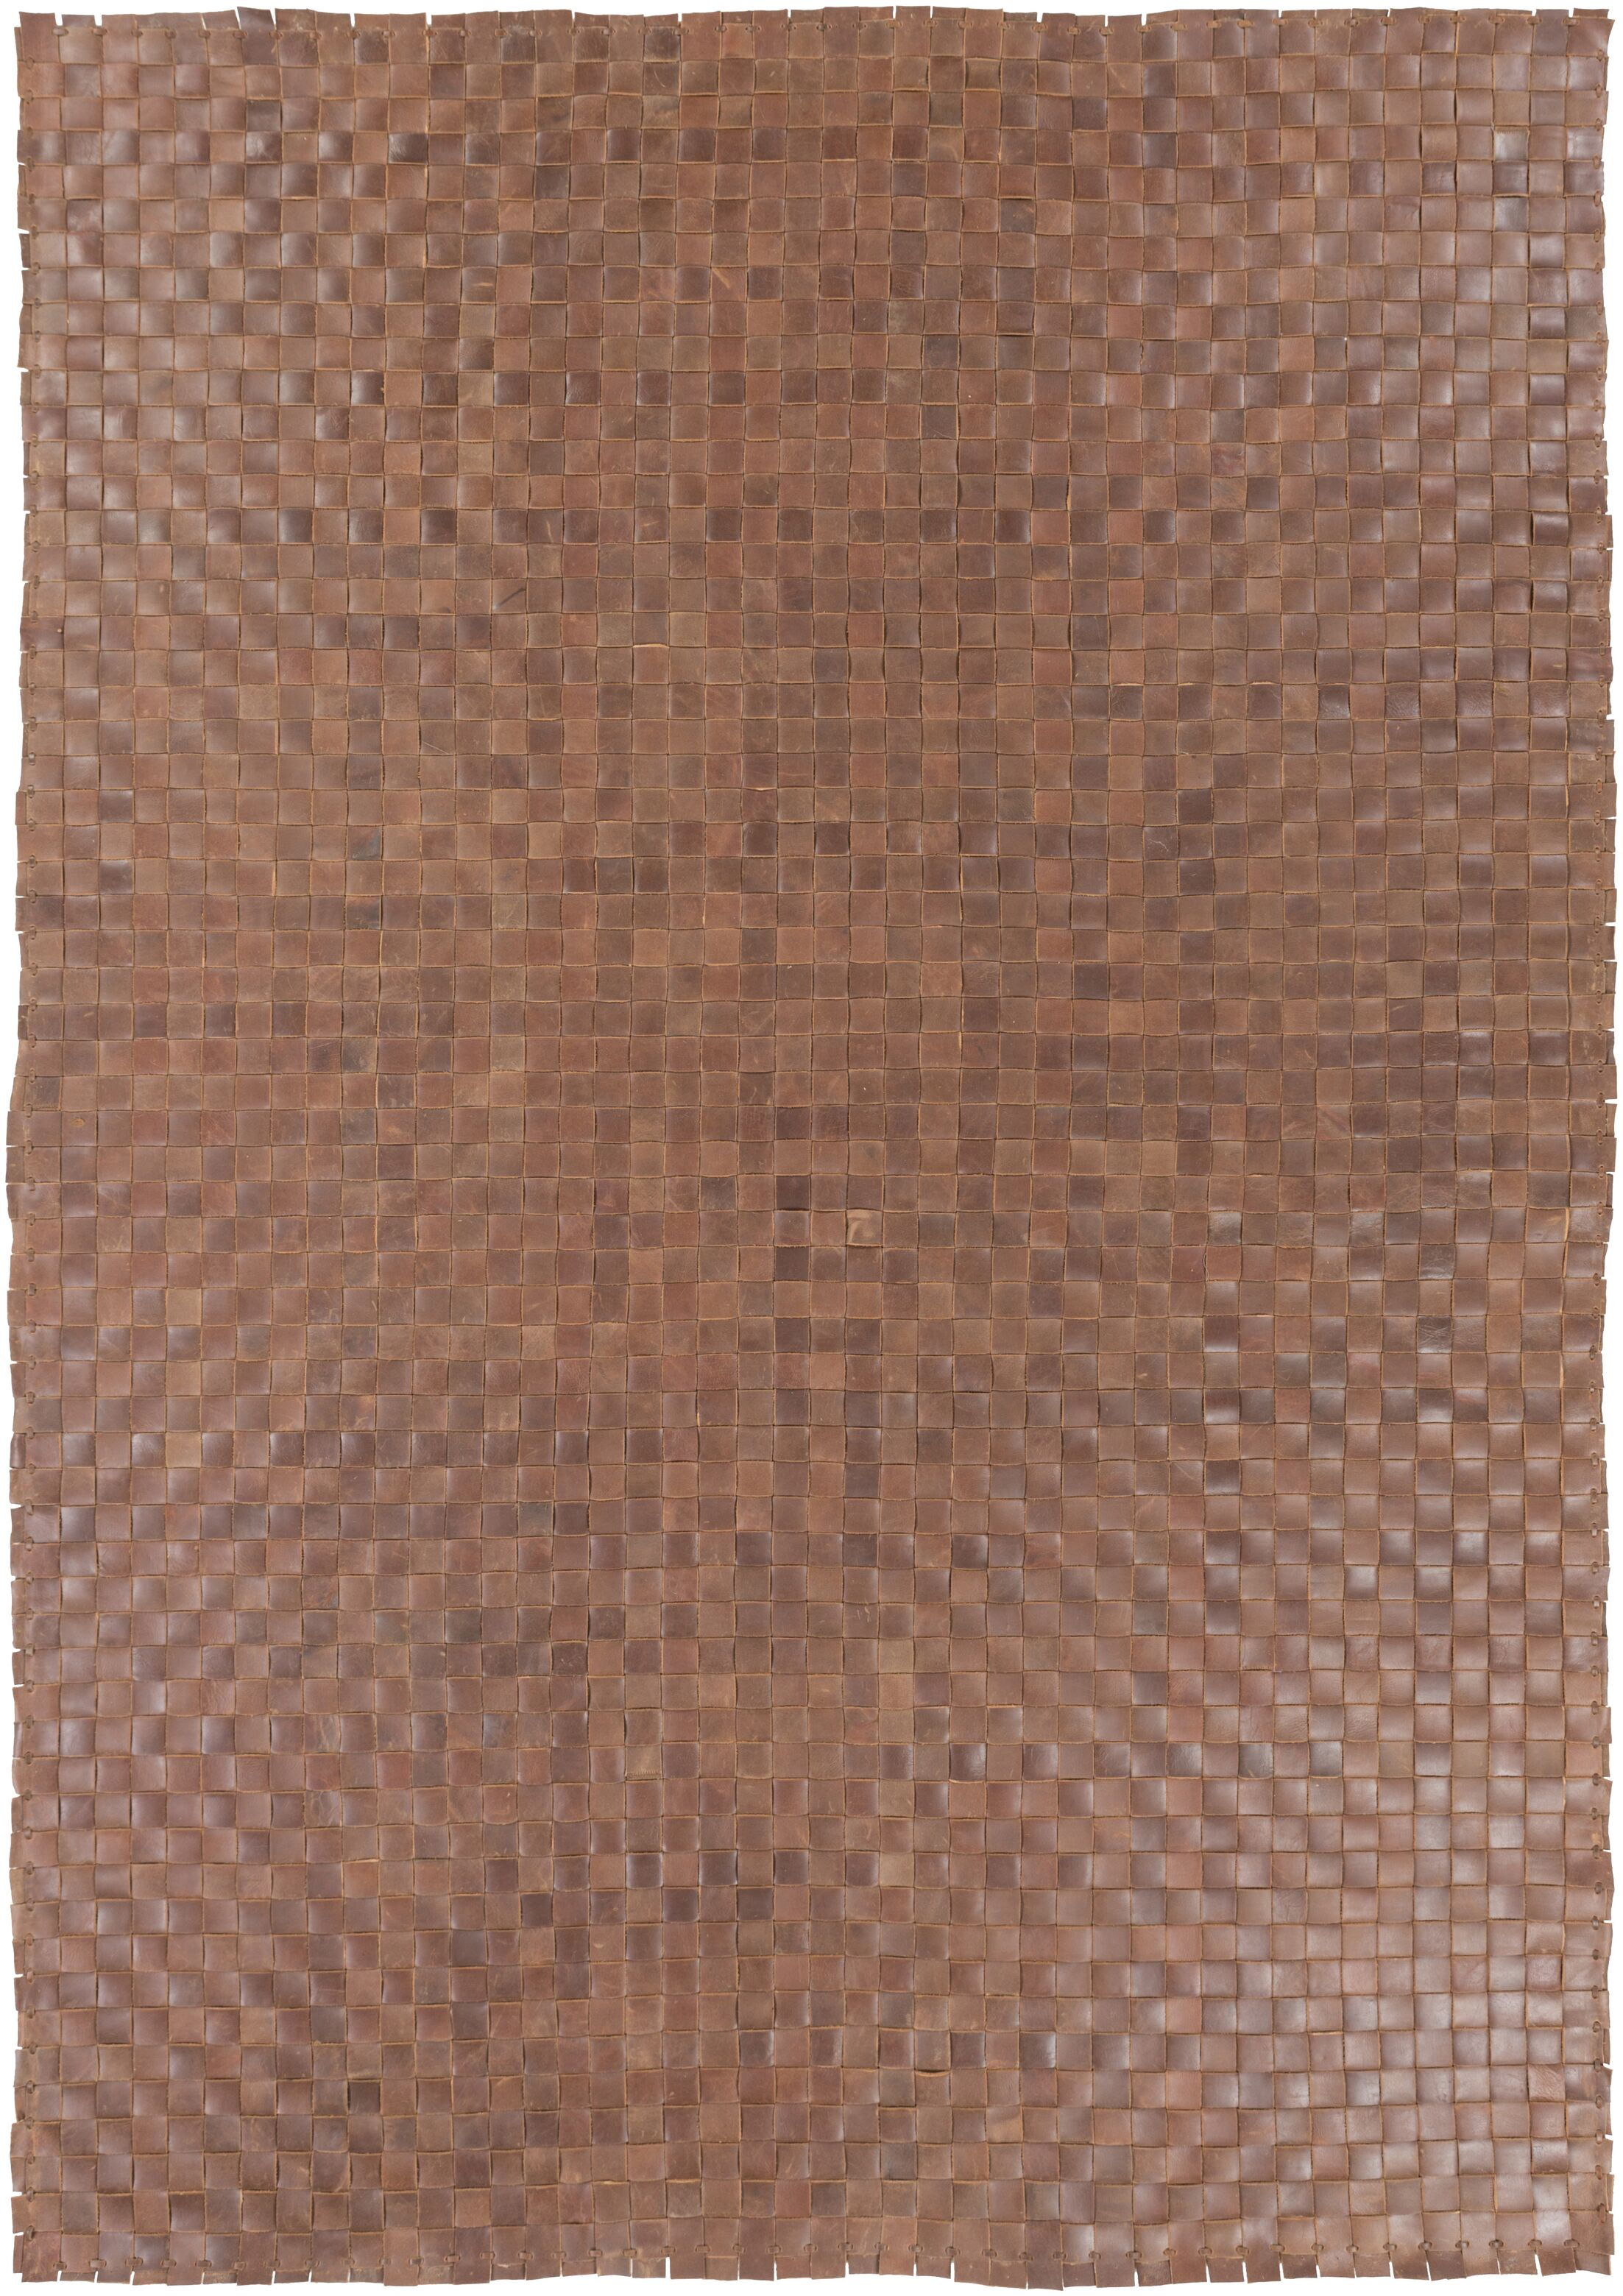 Taraji Hand Woven Brown Indoor/Outdoor Area Rug Rug Size: Rectangle 5' x 7'6